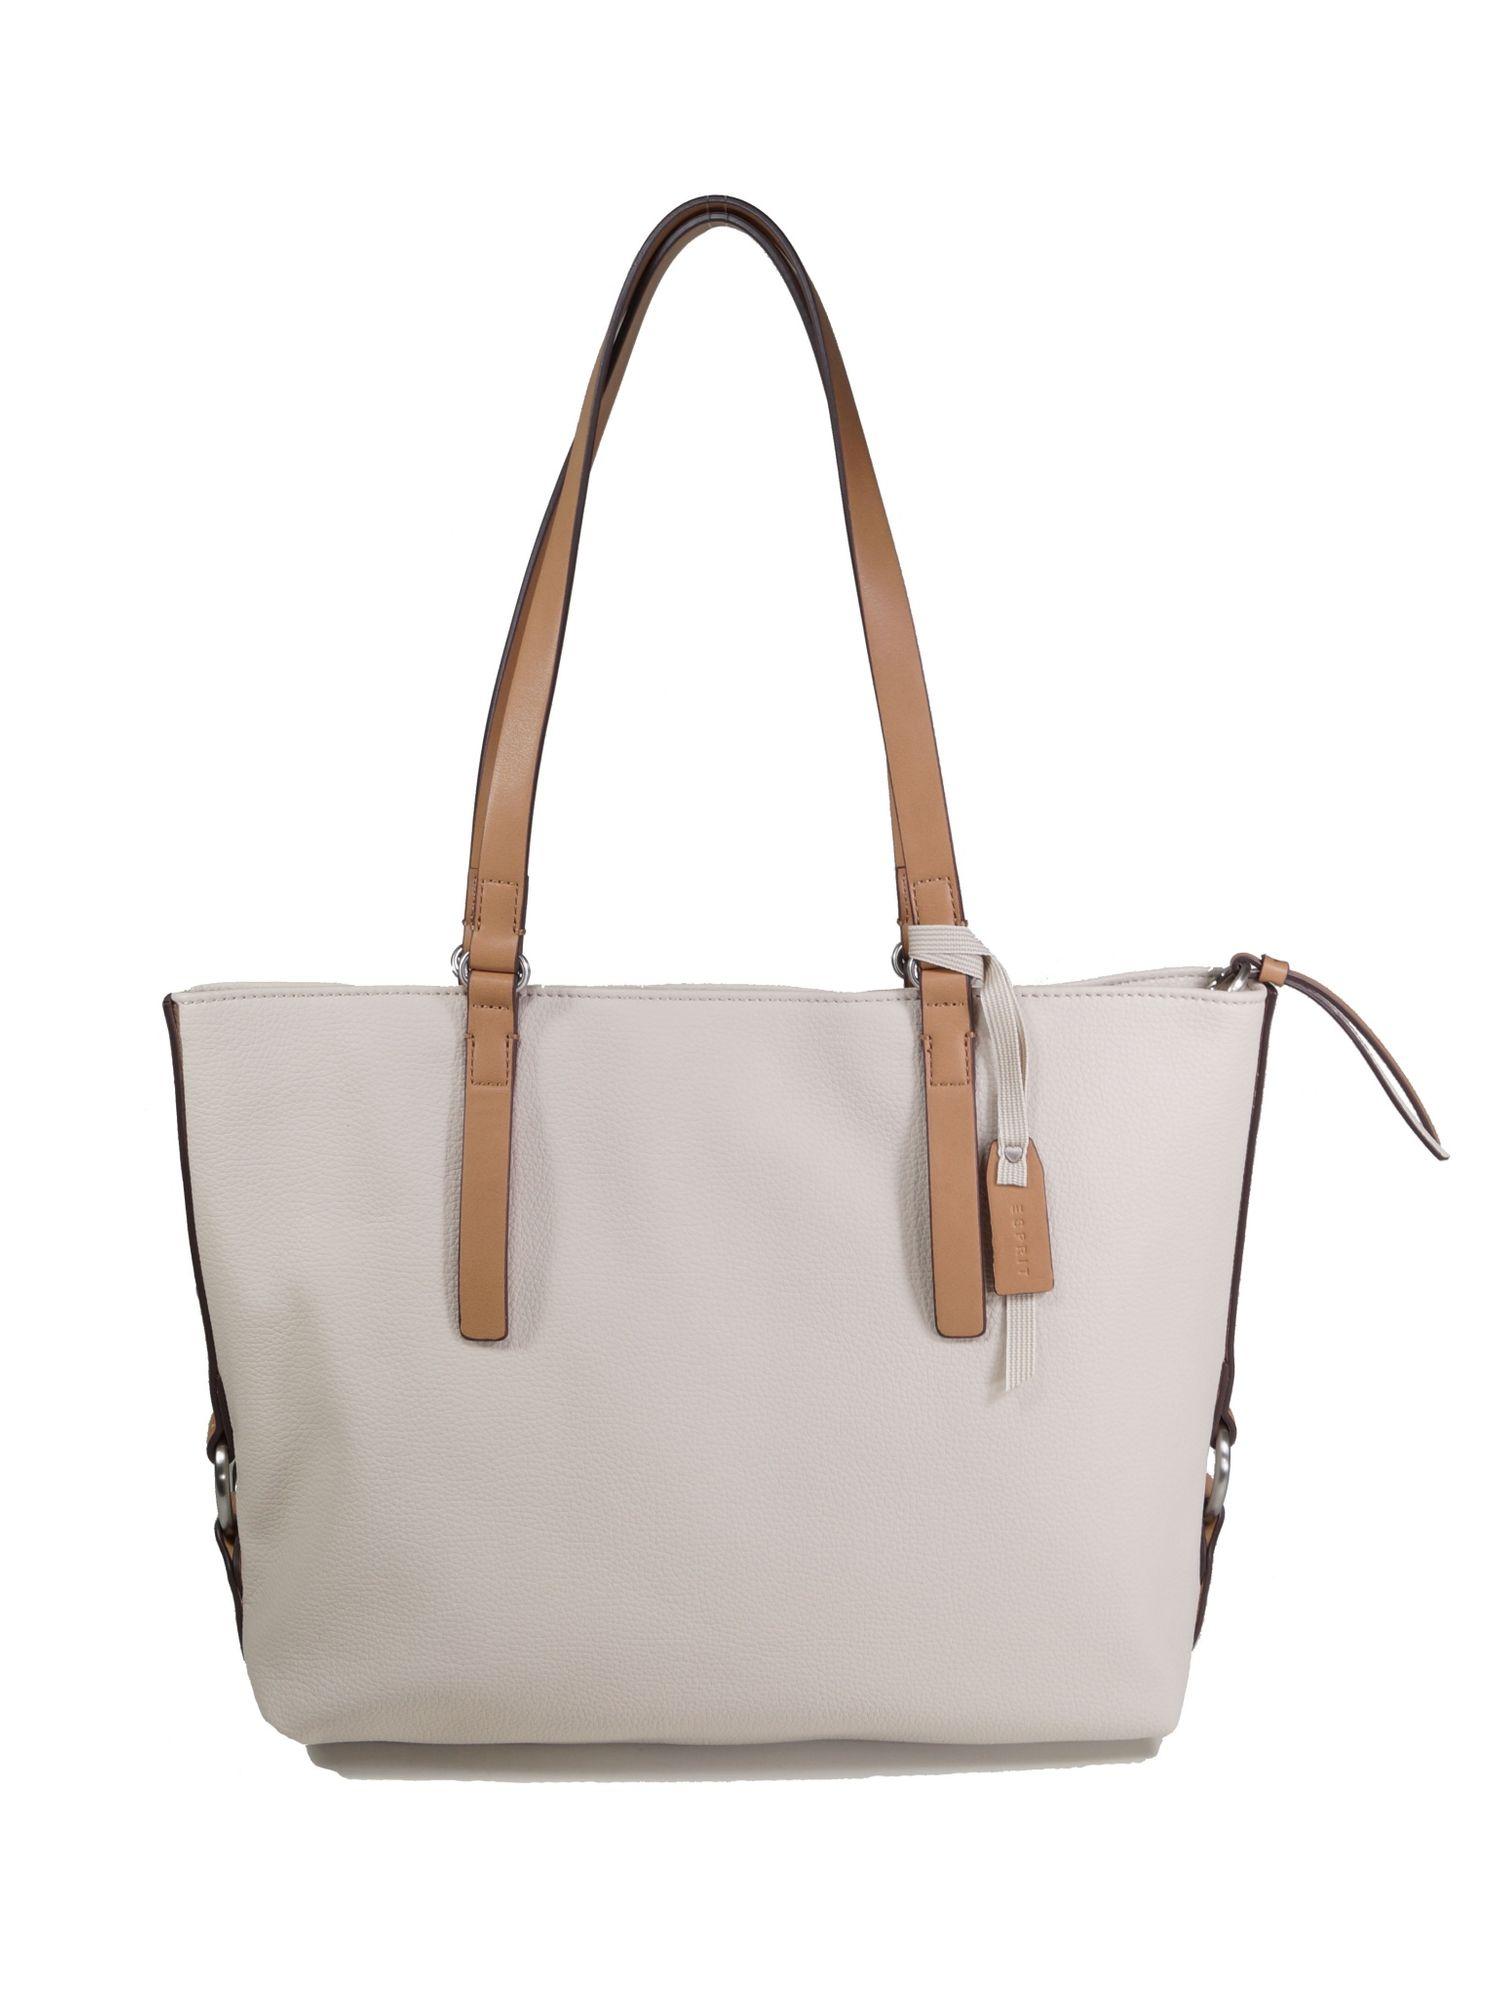 963f9e61c5300a Damen Kaufen Tasche Esprit Handtasche Shopper Weiß Cheryl TF1J3lKc